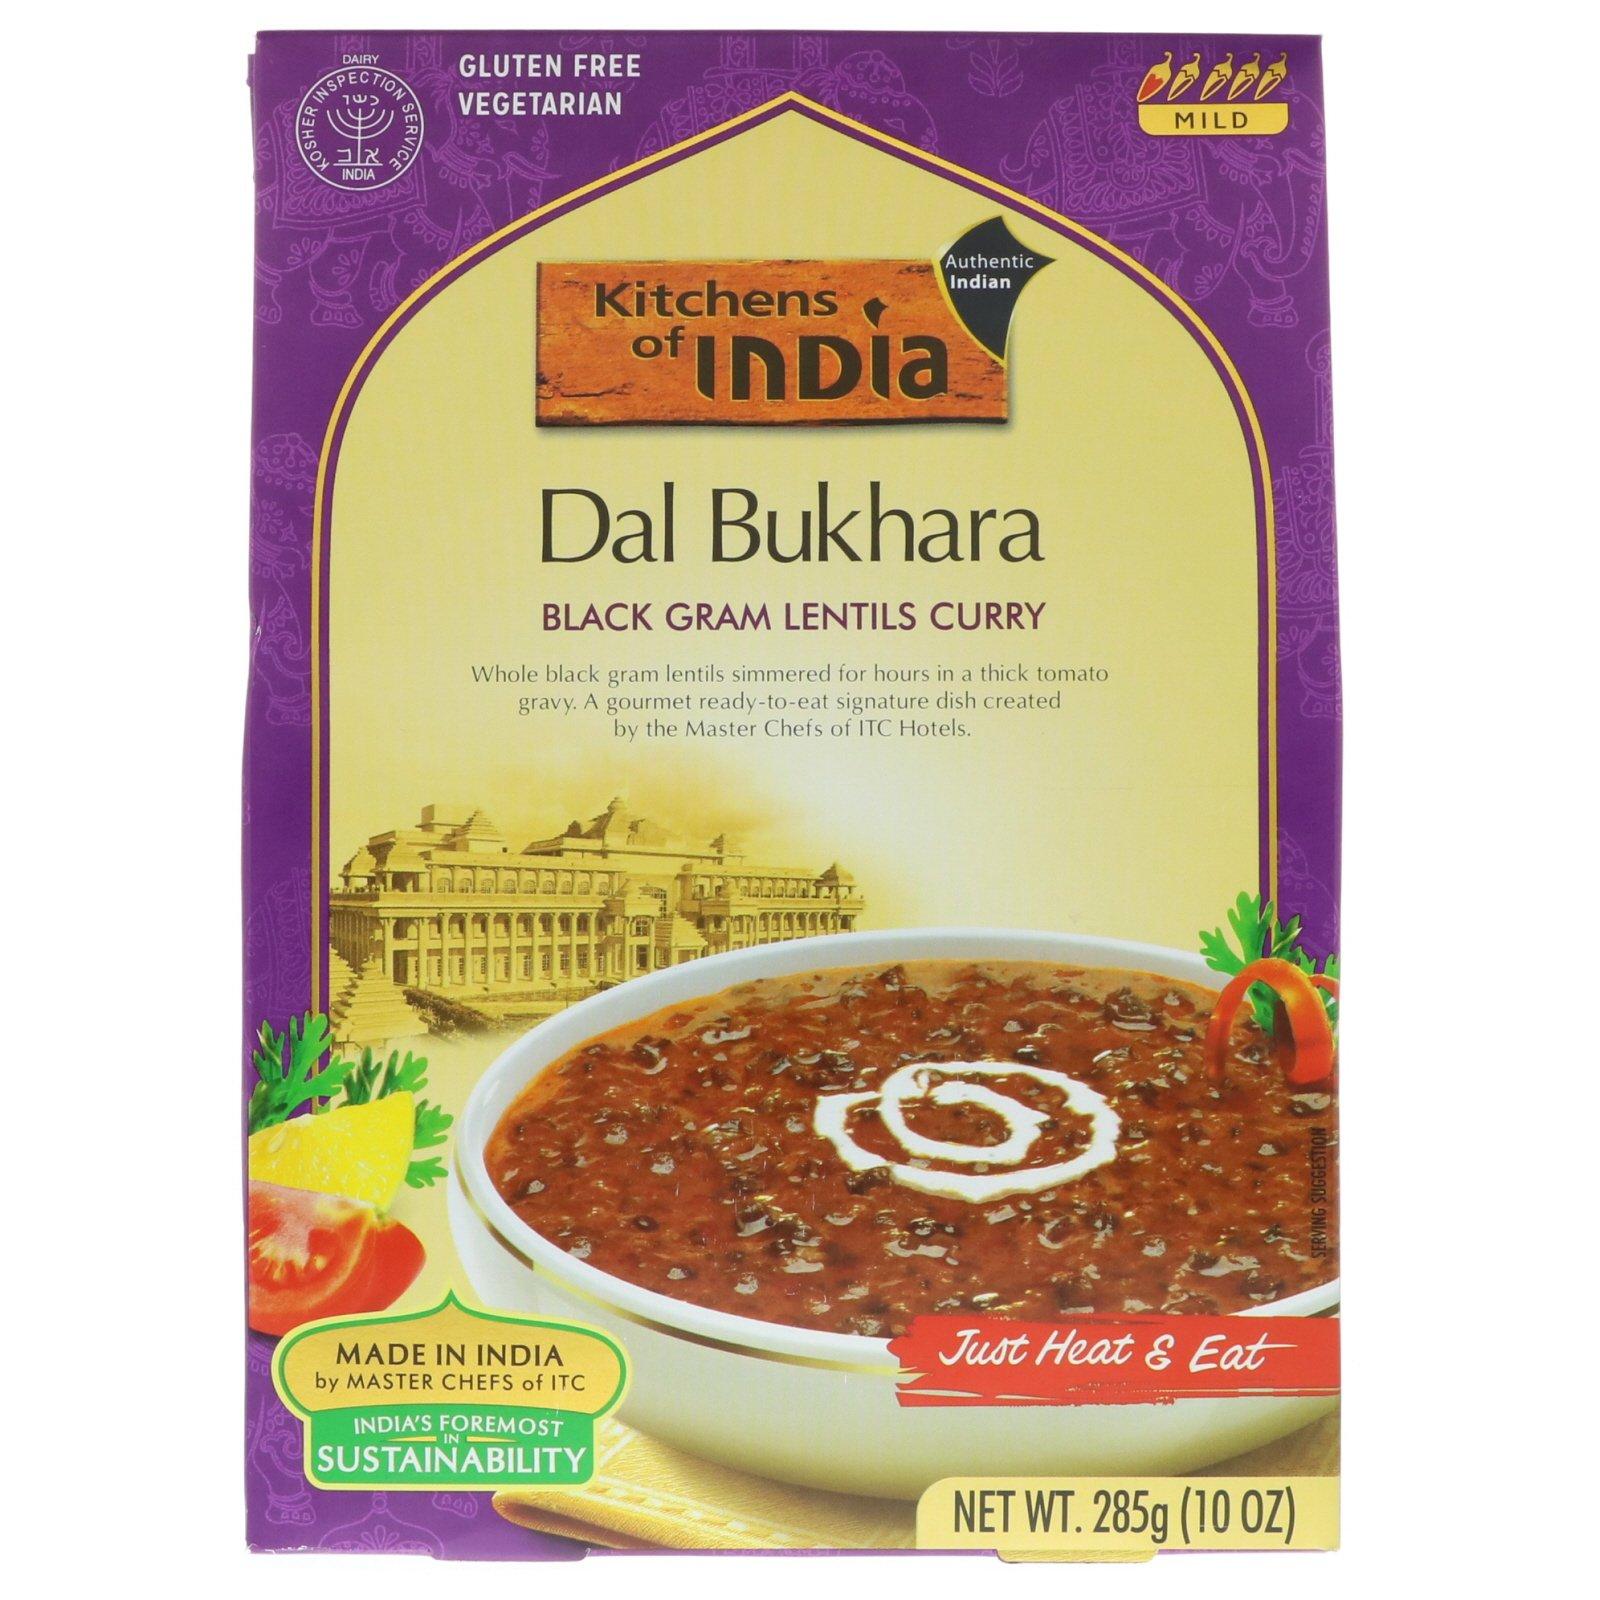 Kitchens Of India, Dal Bukhara, Black Gram Lentils Curry, Mild, 10 Oz